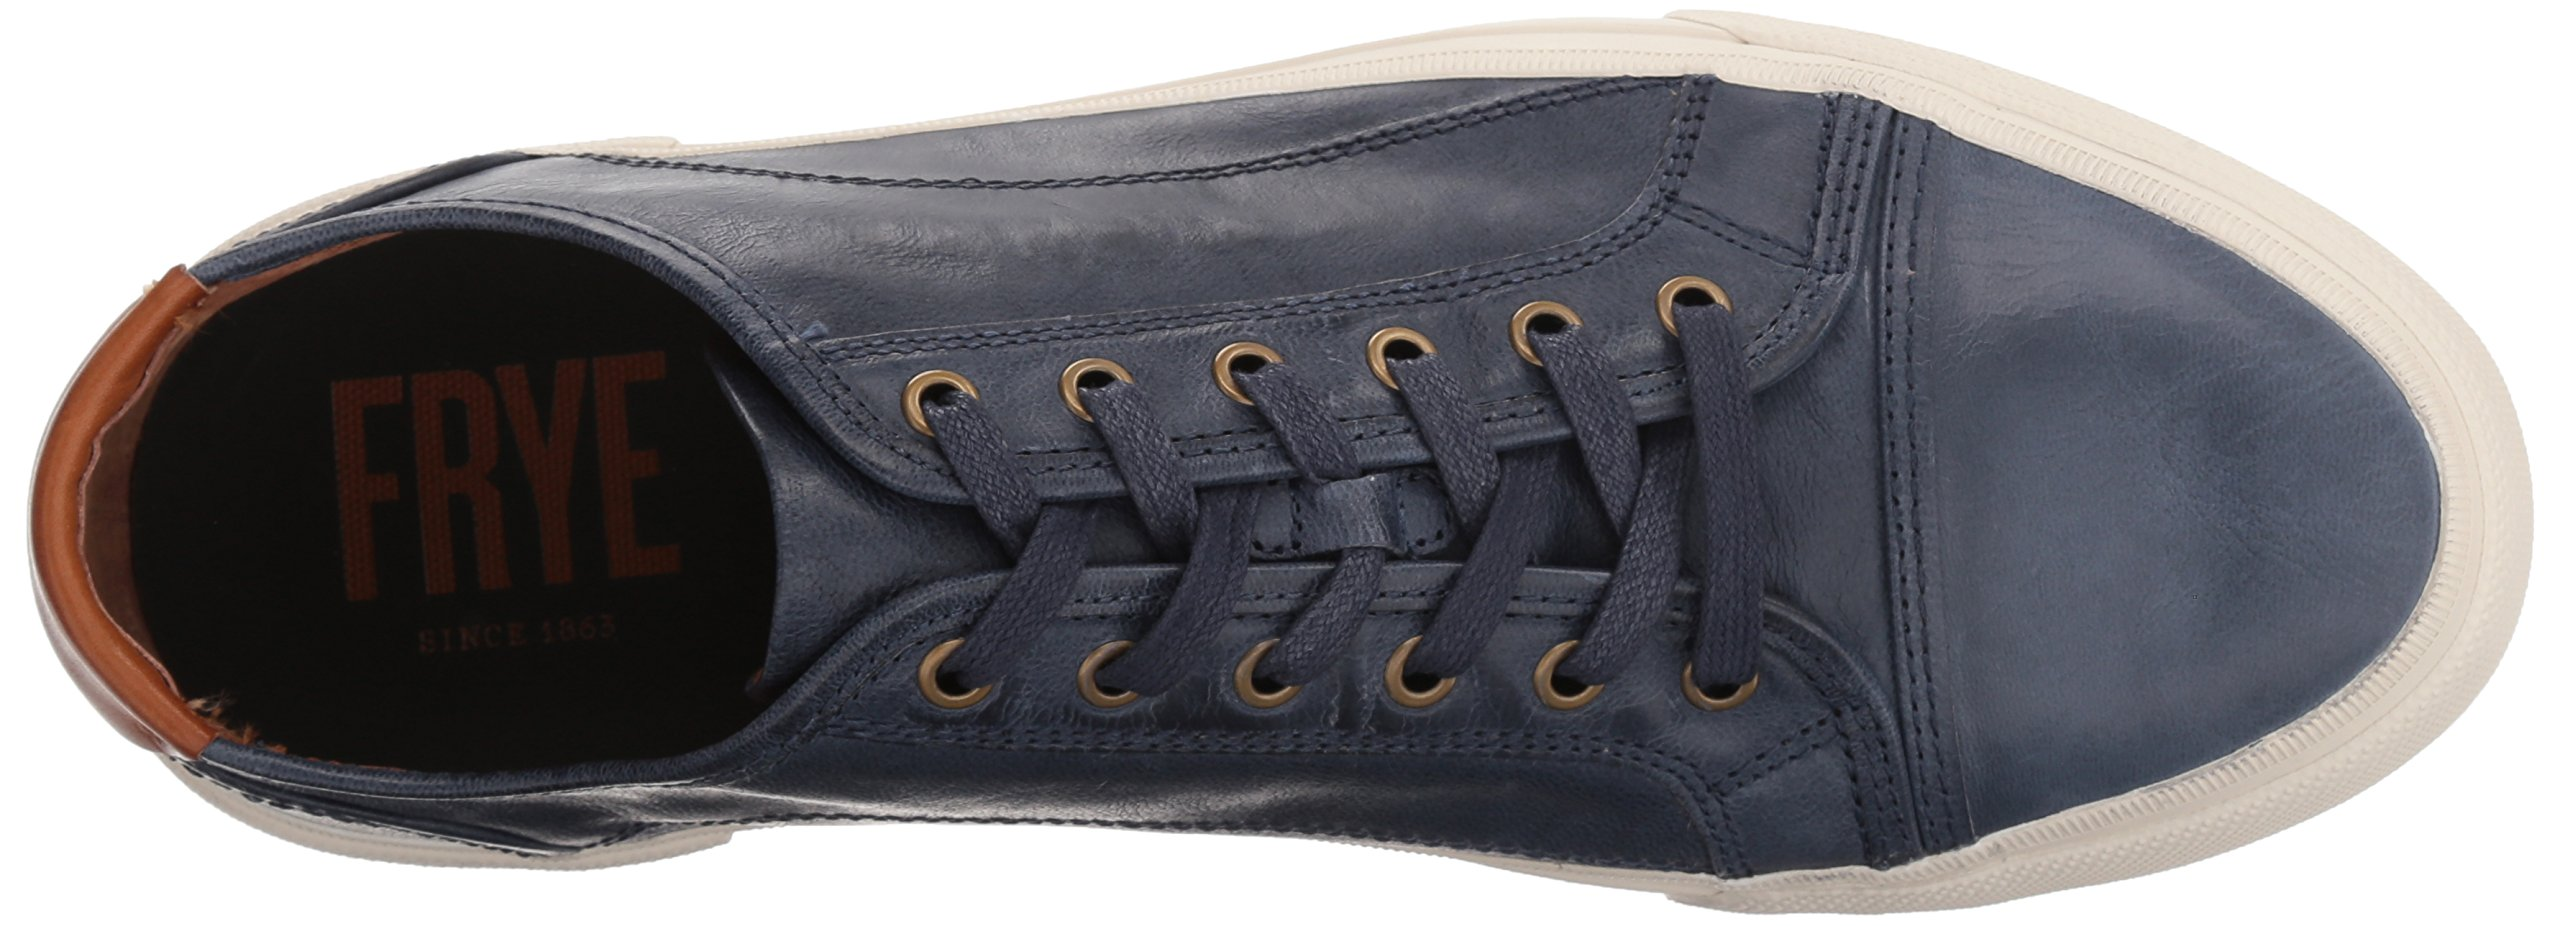 FRYE Men's Ludlow Cap Lowlace Sneaker, Navy, 11 Medium US by FRYE (Image #8)